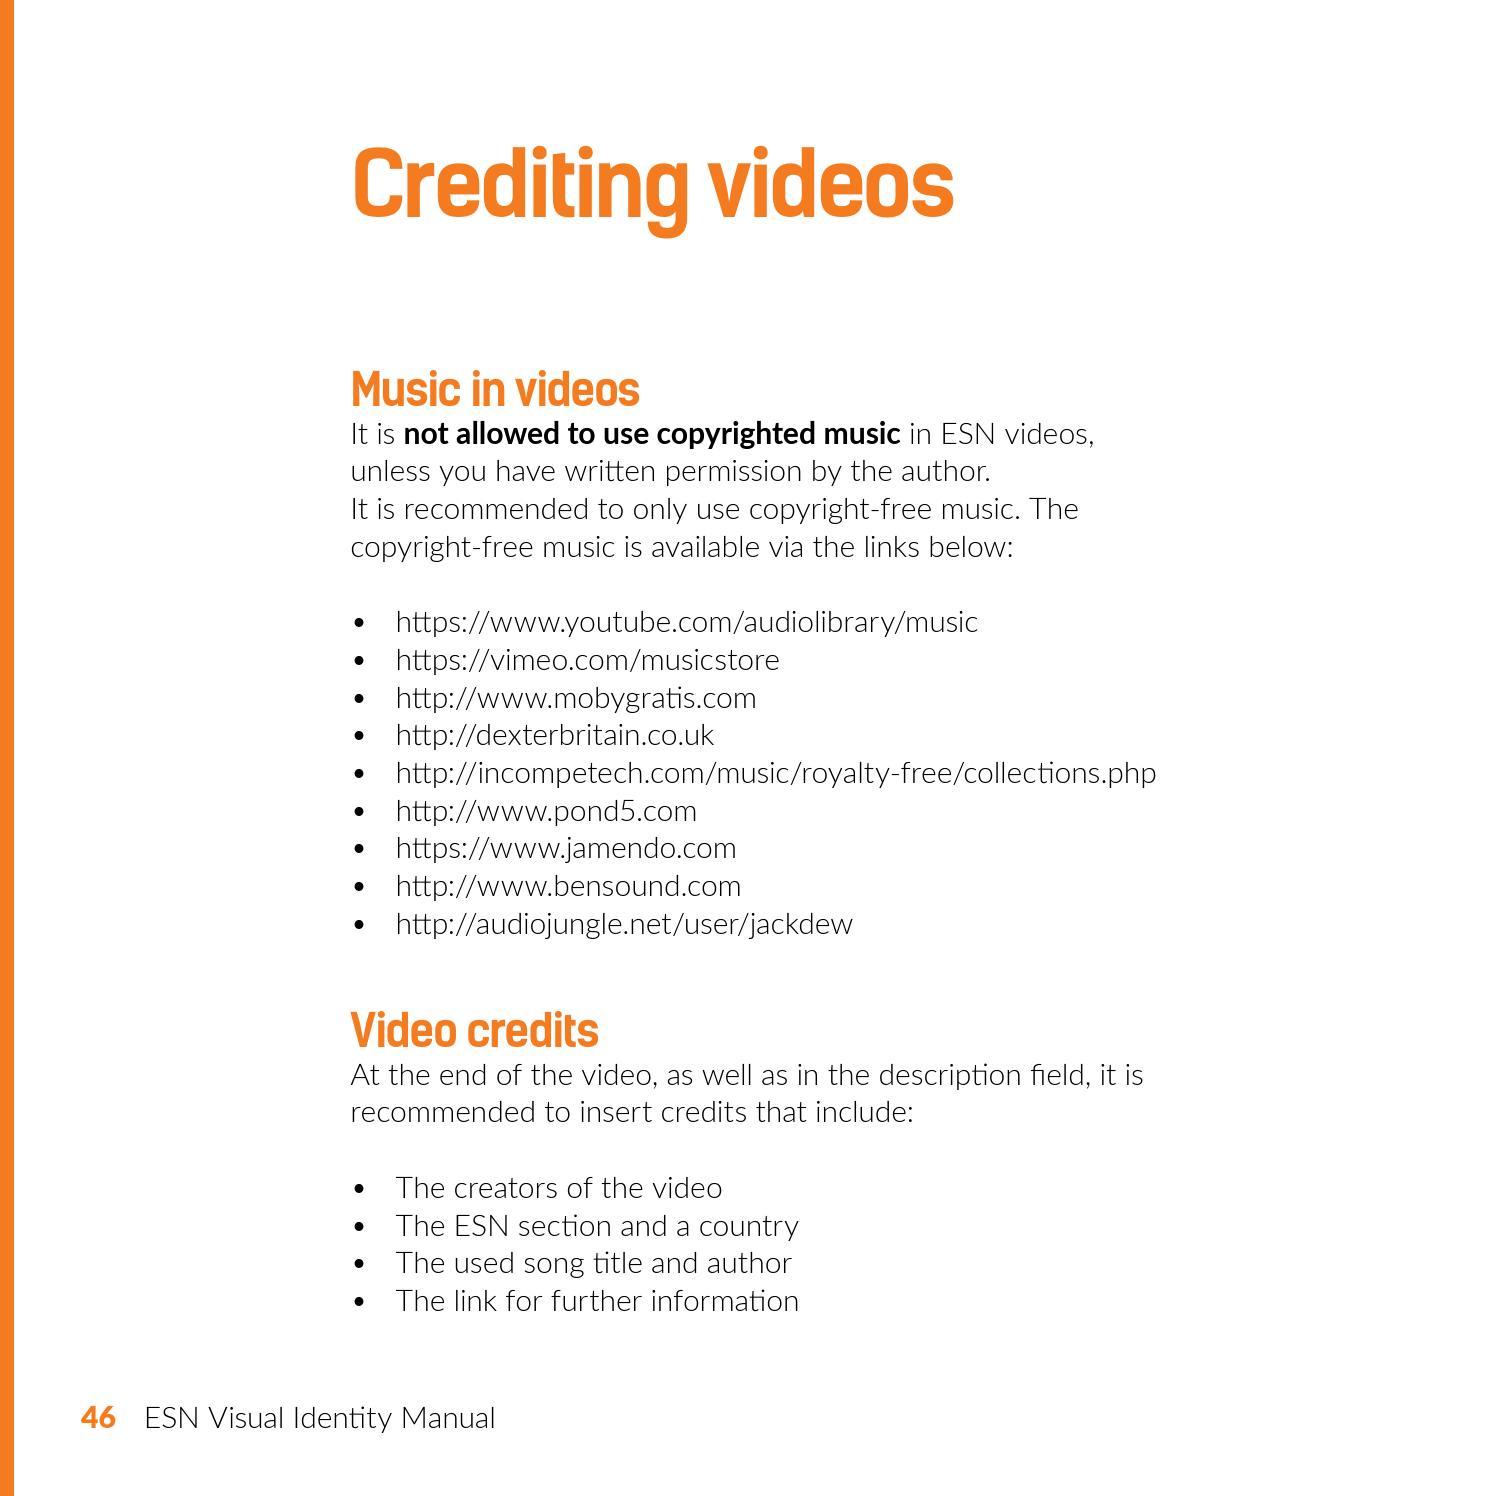 ESN Visual Identity Manual 2015 by Erasmus Student Network